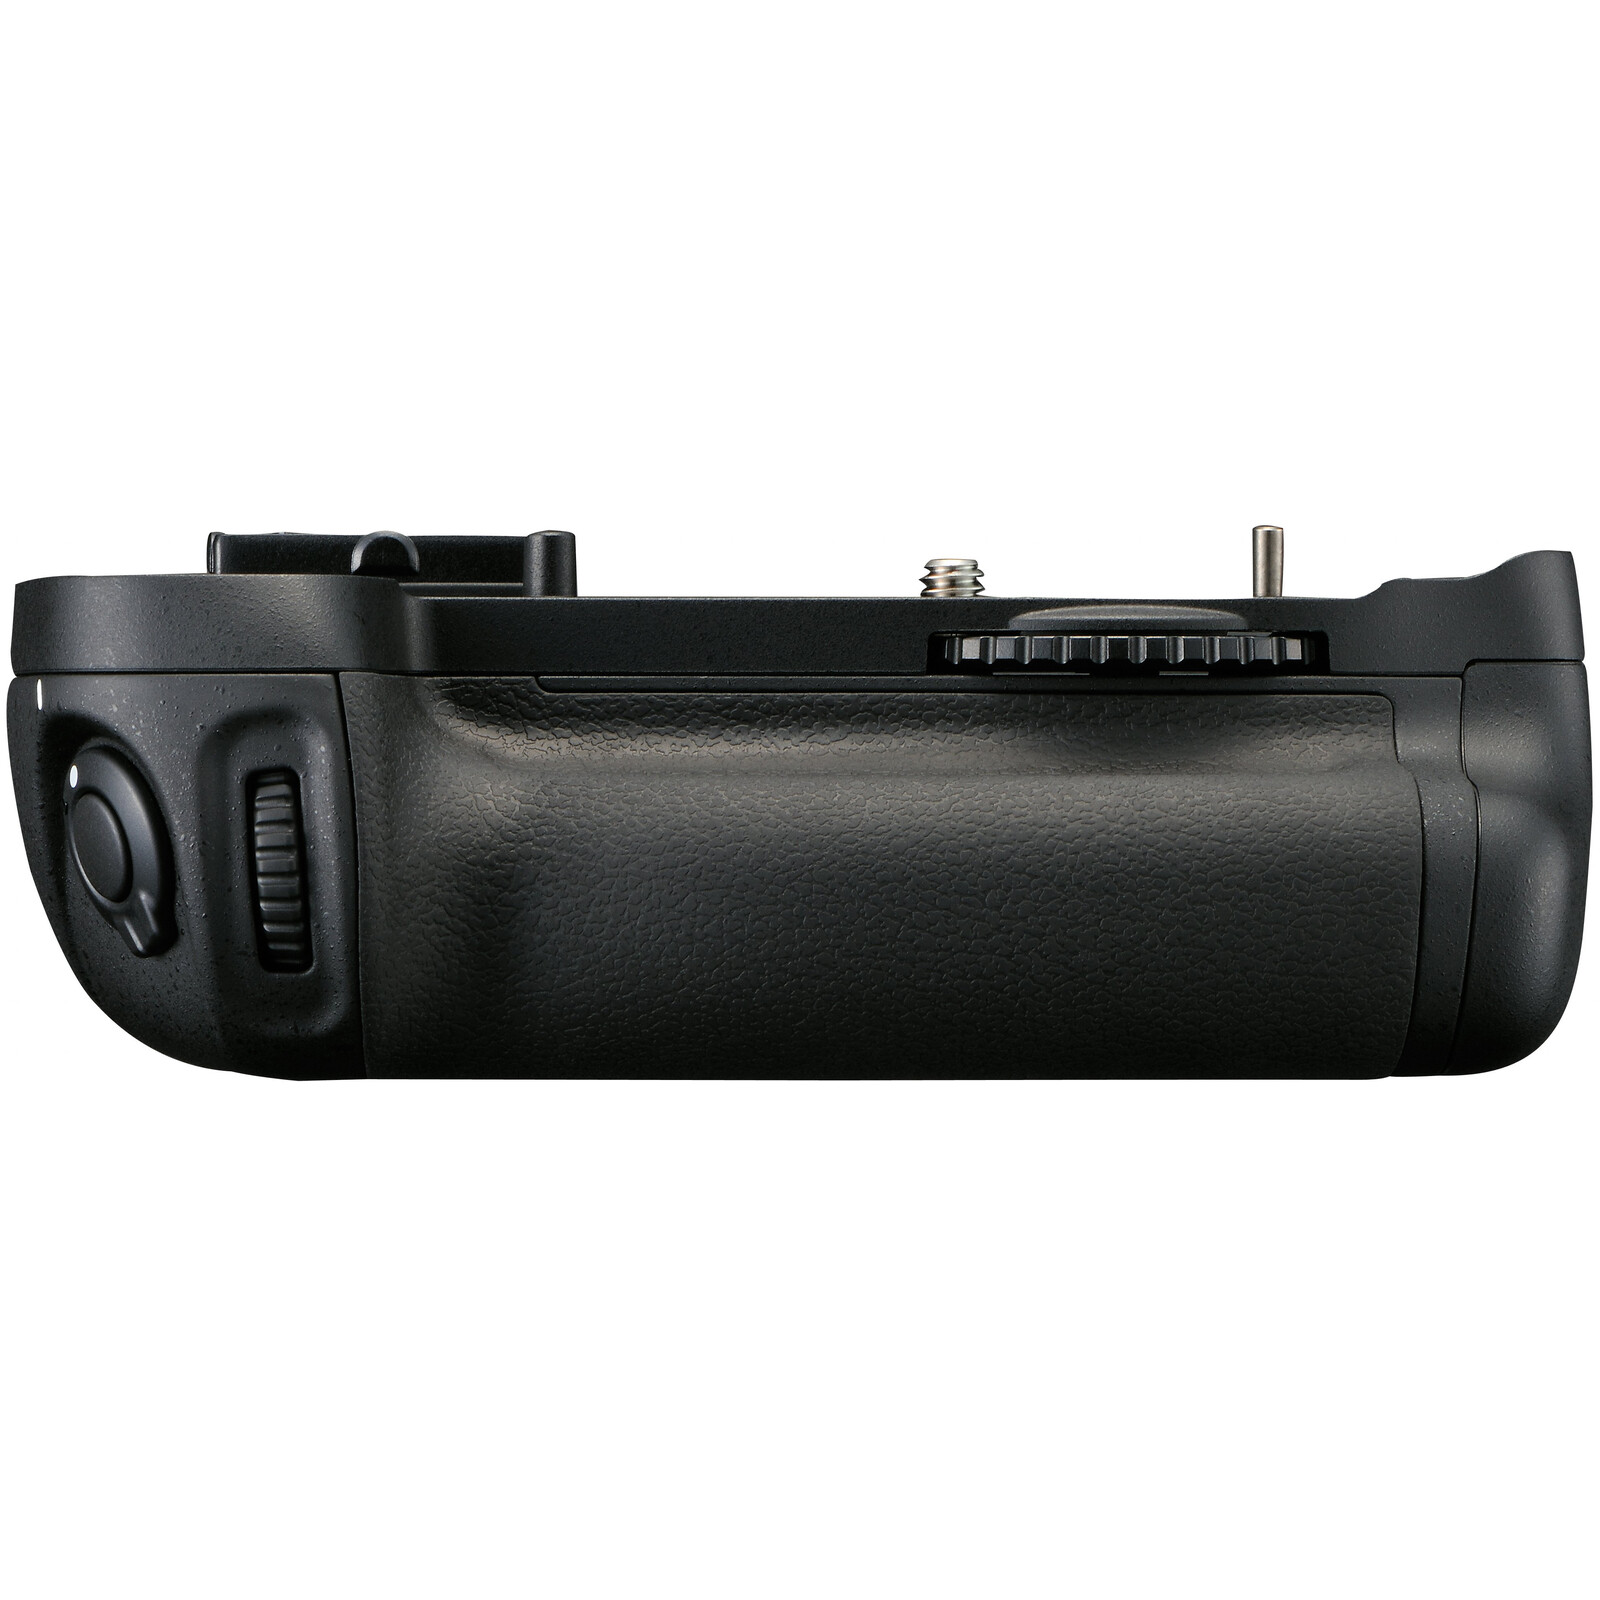 Nikon MB-D14 Multifunktionshandgriff